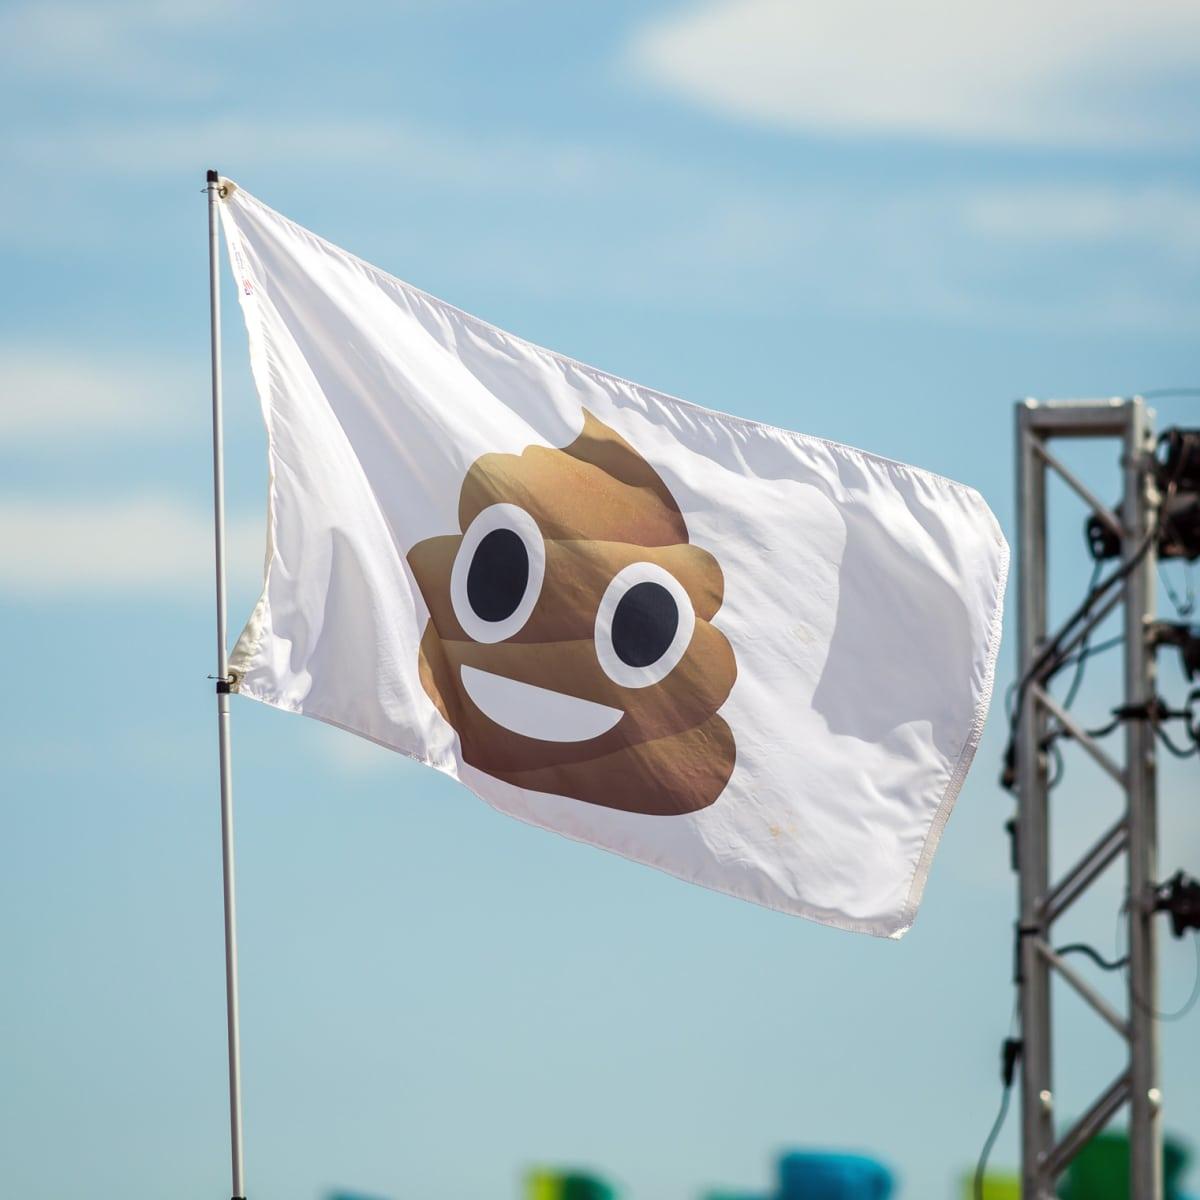 Austin City Limits Festival ACL 2015 Weekend One Best Signs Best Flags Poop Emoji